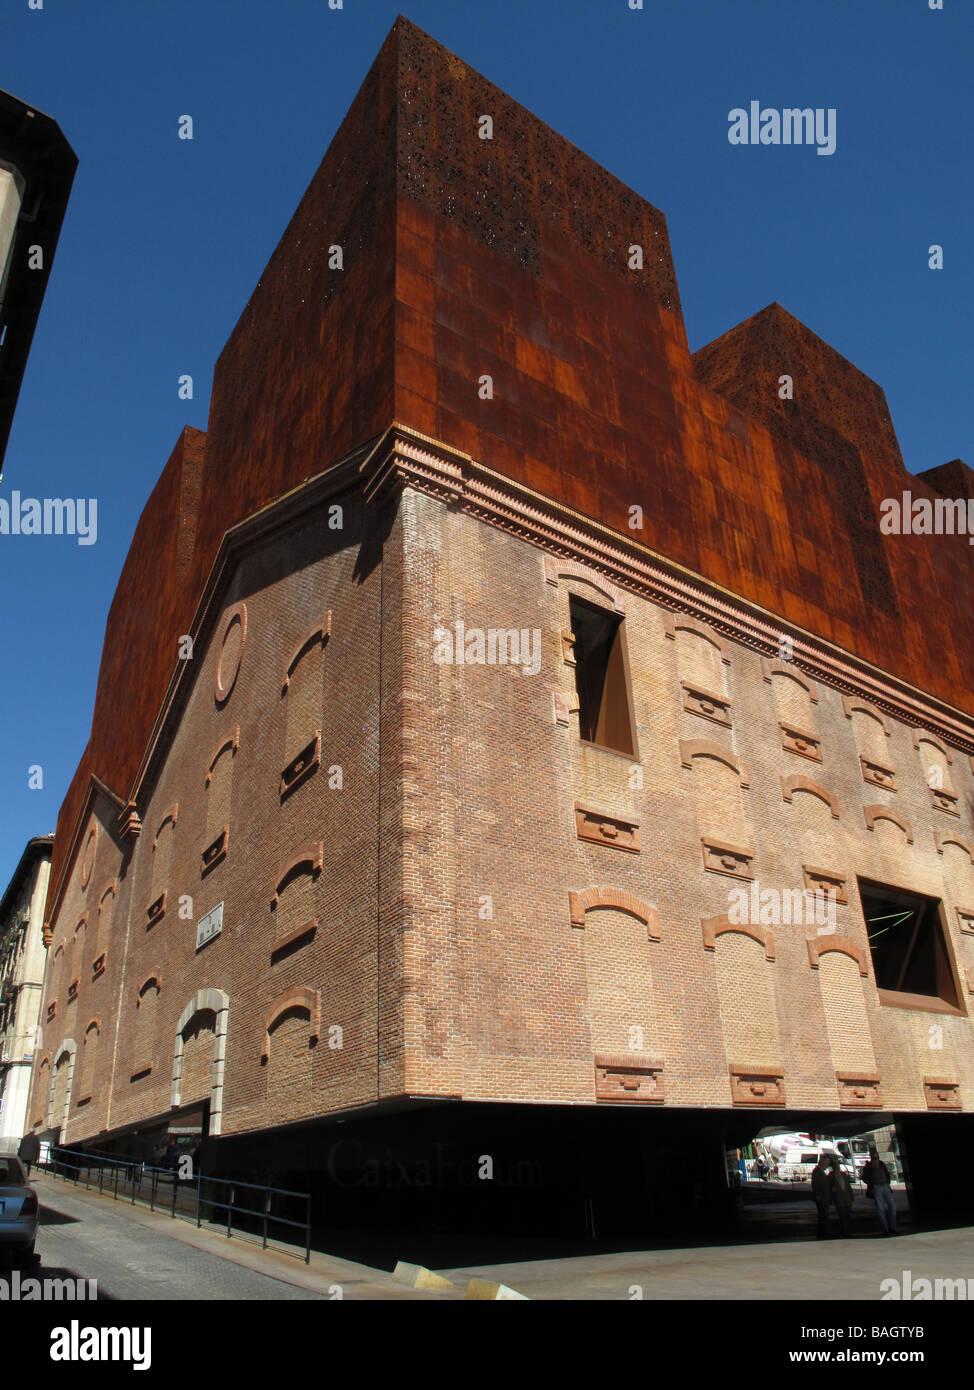 Caixaforum madrid museo da architetti svizzeri herzog de meuron giardino verticale di patrick - Giardino verticale madrid ...